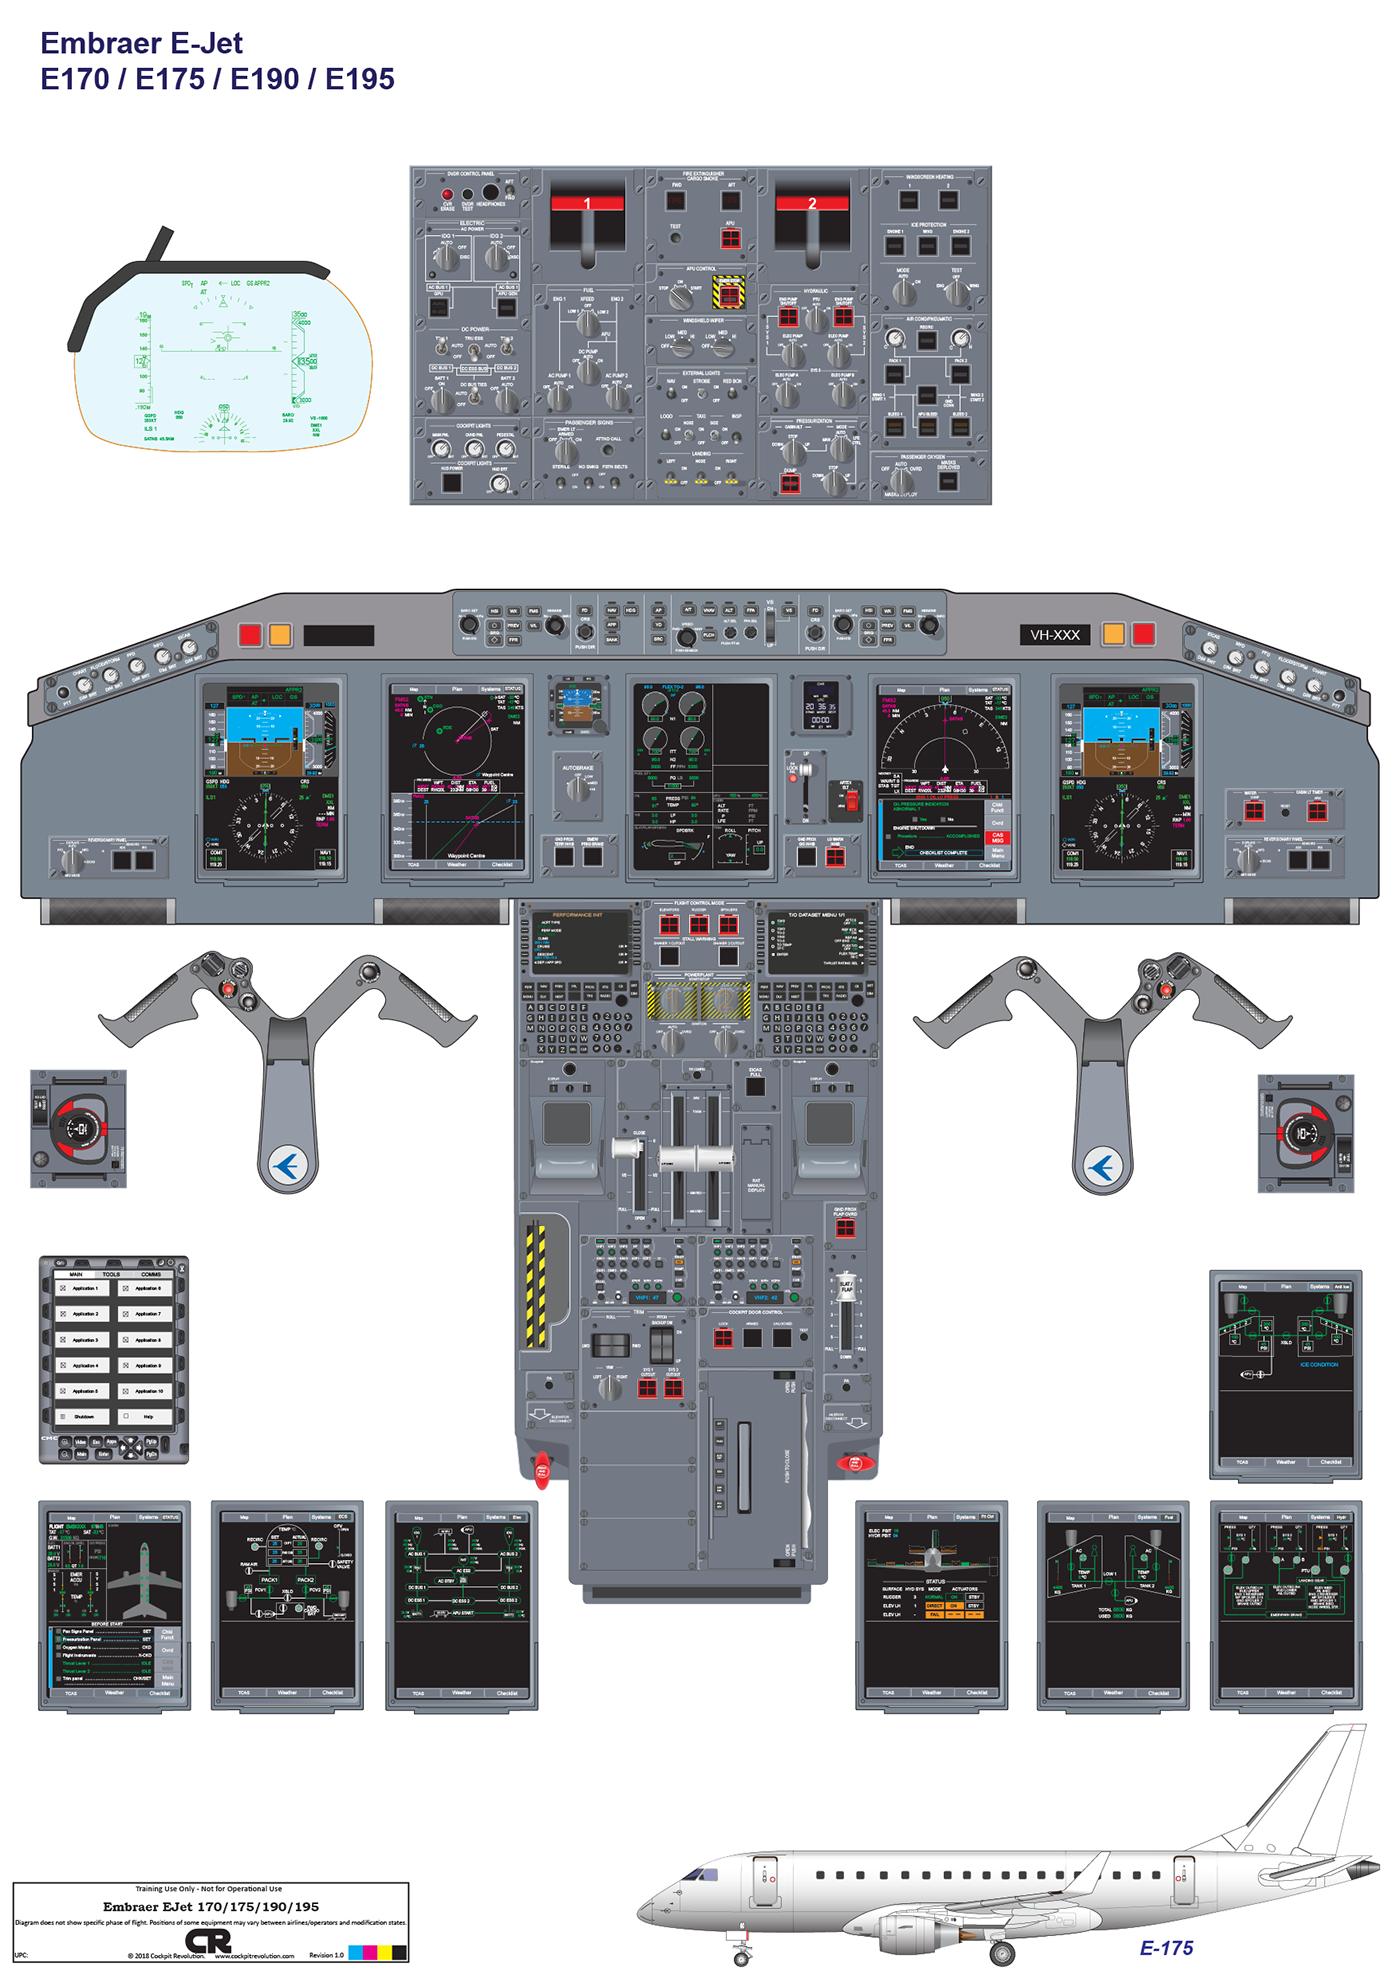 Embraer E-Jet E170/175/190/195 Cockpit Training Diagram on